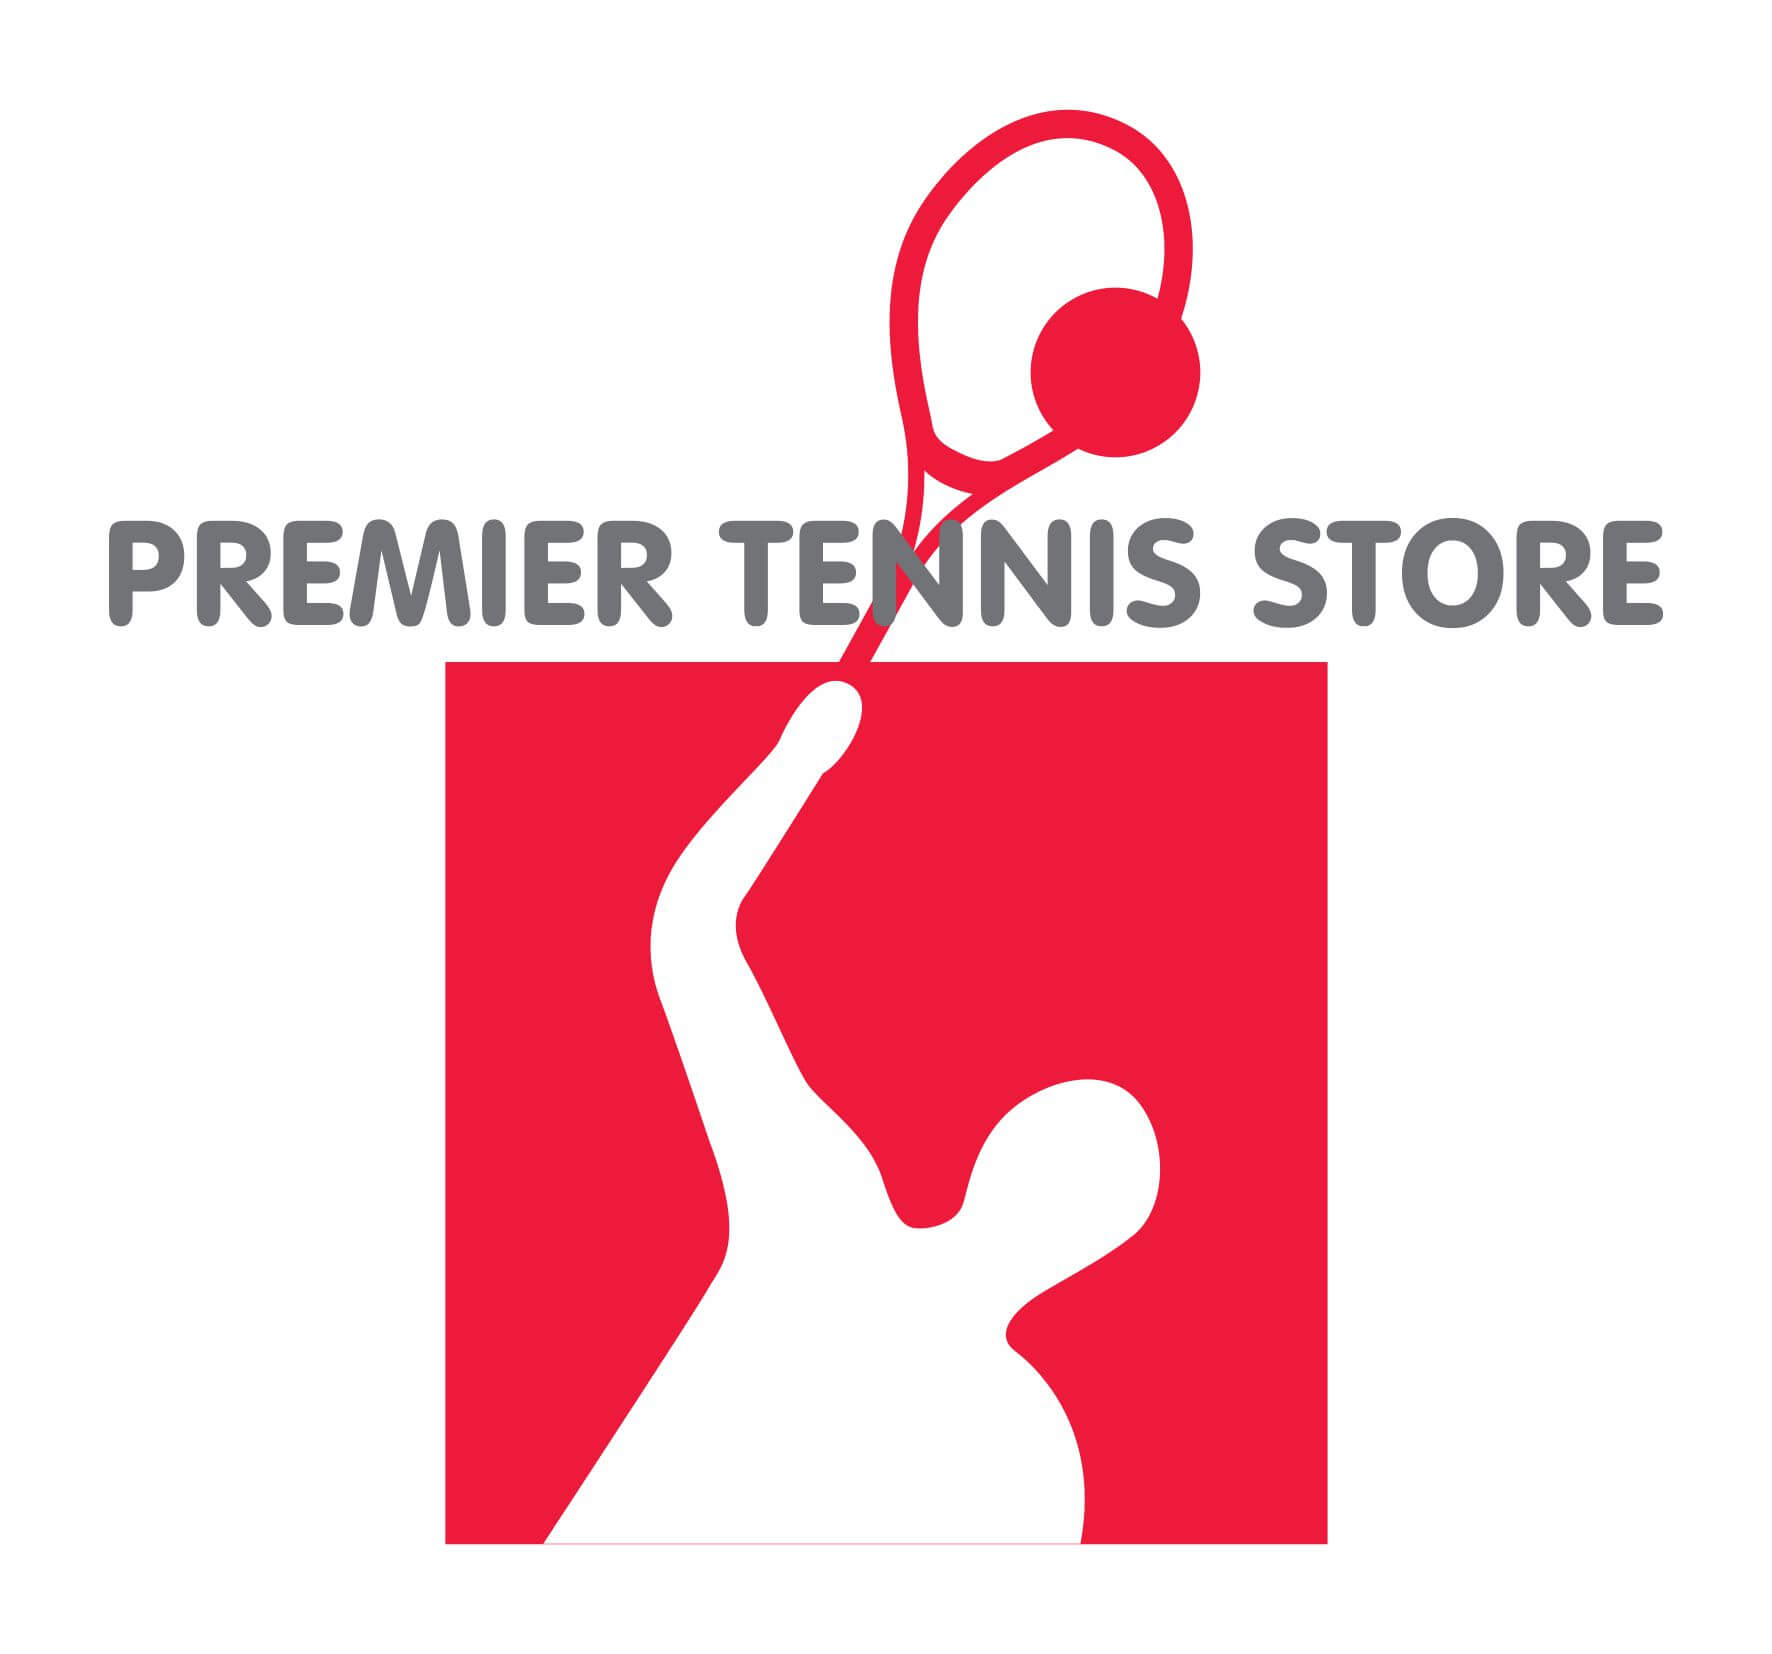 logo-premier-tennis-store-rosu